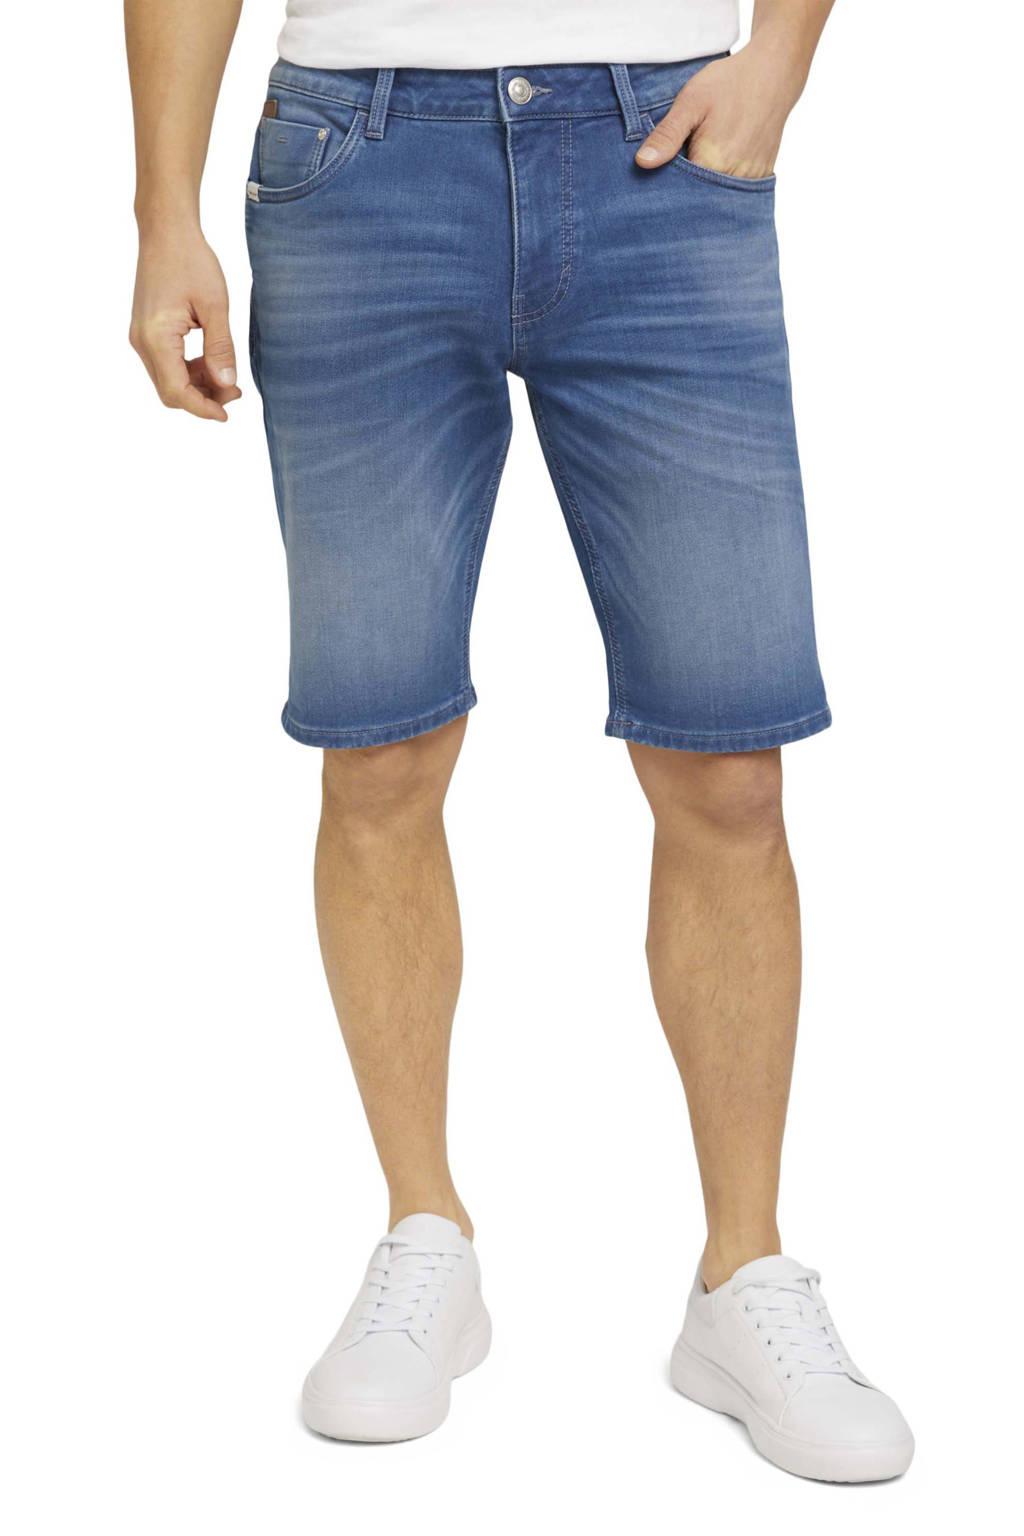 Tom Tailor regular fit jeans short mid stone wash denim, Mid stone wash denim